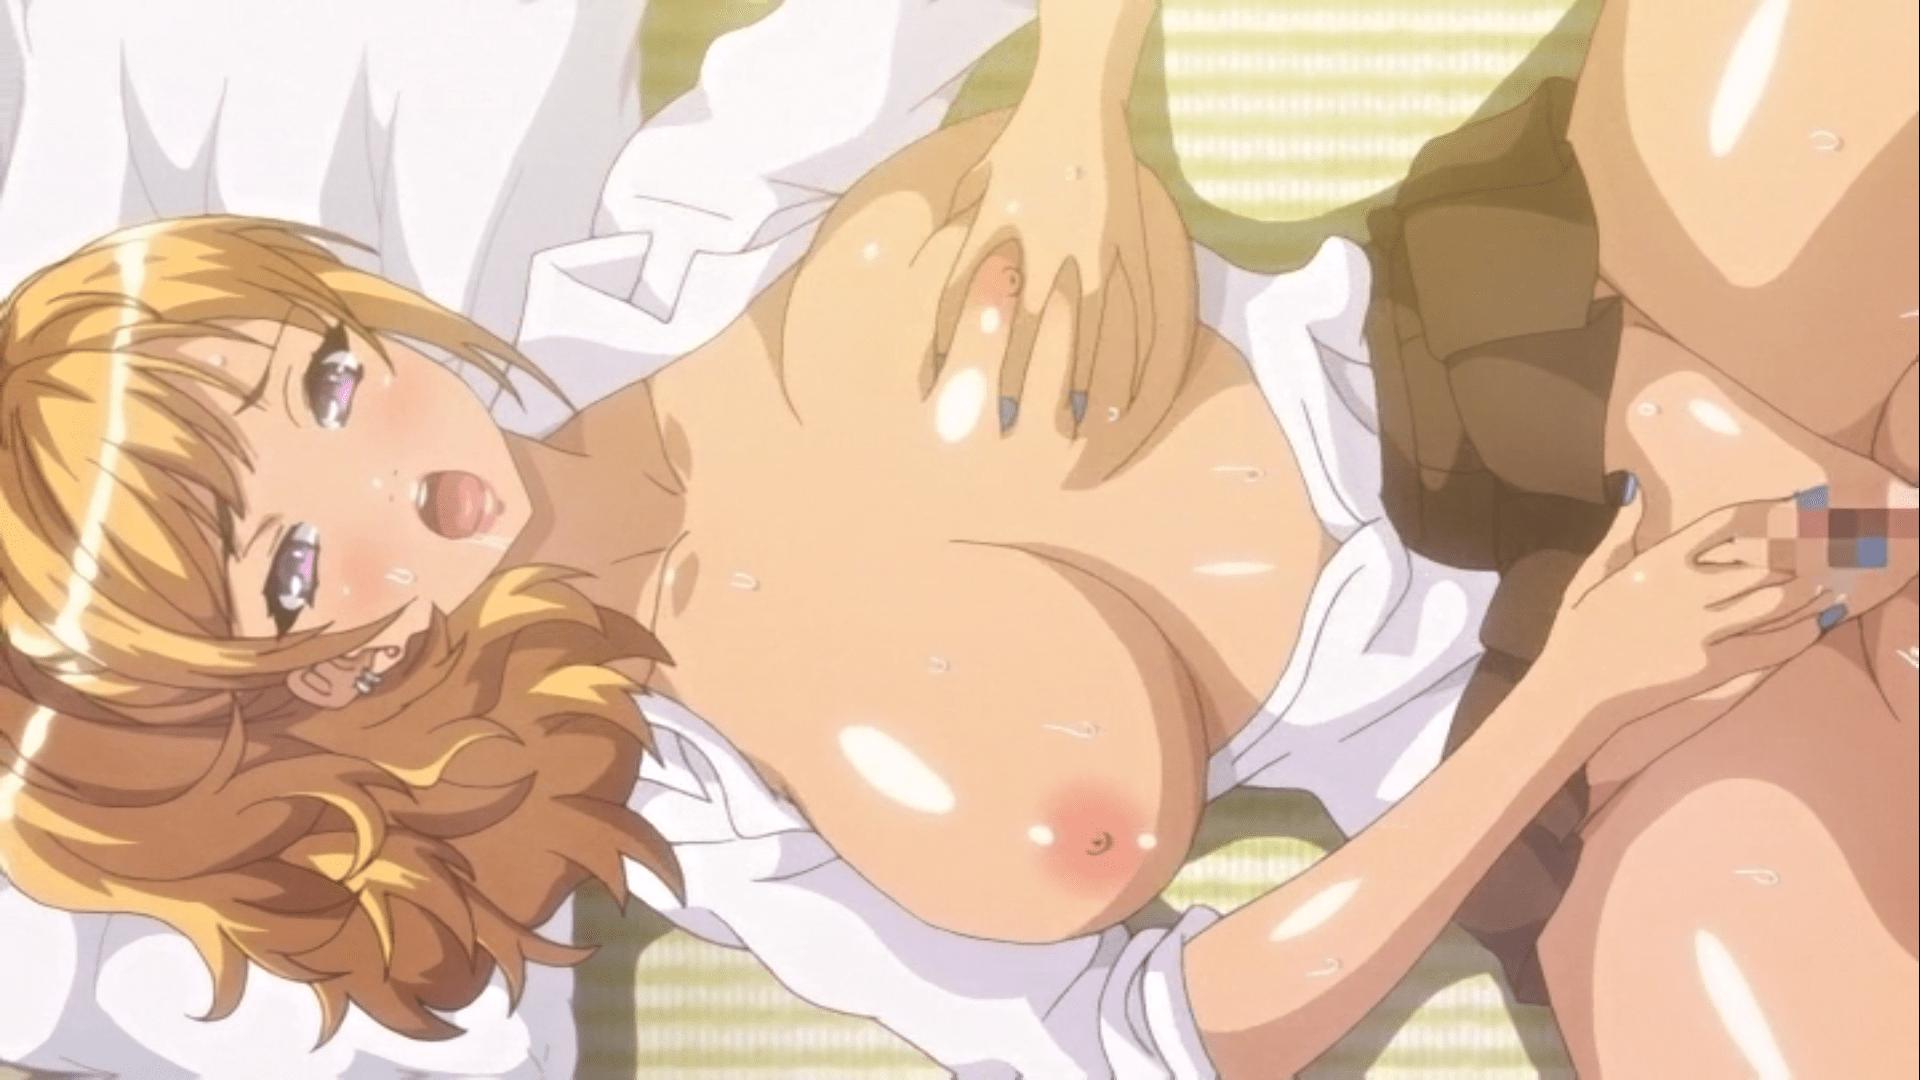 HentaiVideos.net Shikijou Kyoudan Episode 2